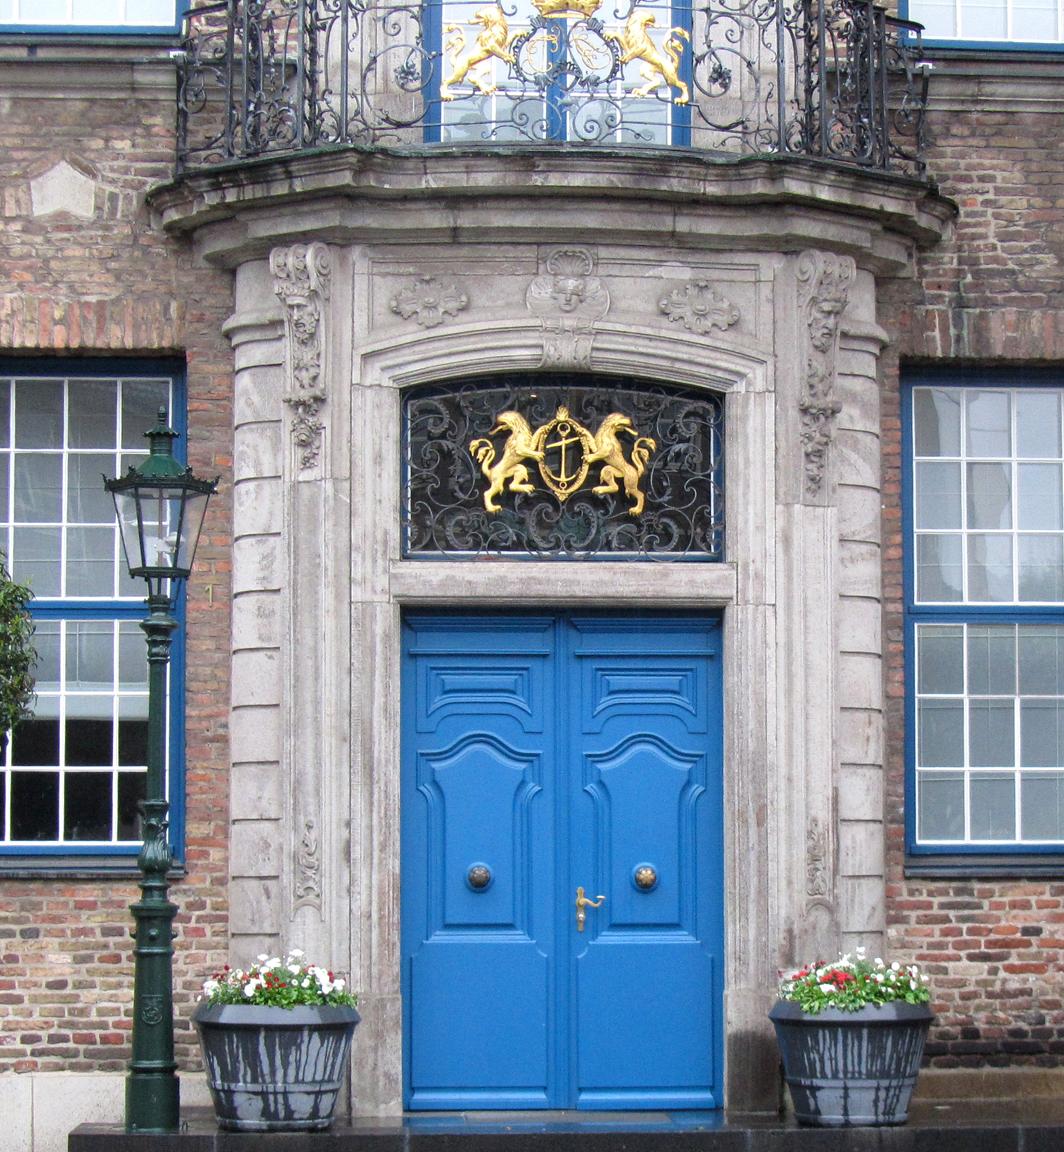 Düsseldorf city hall door (photo by John Hagstrom)